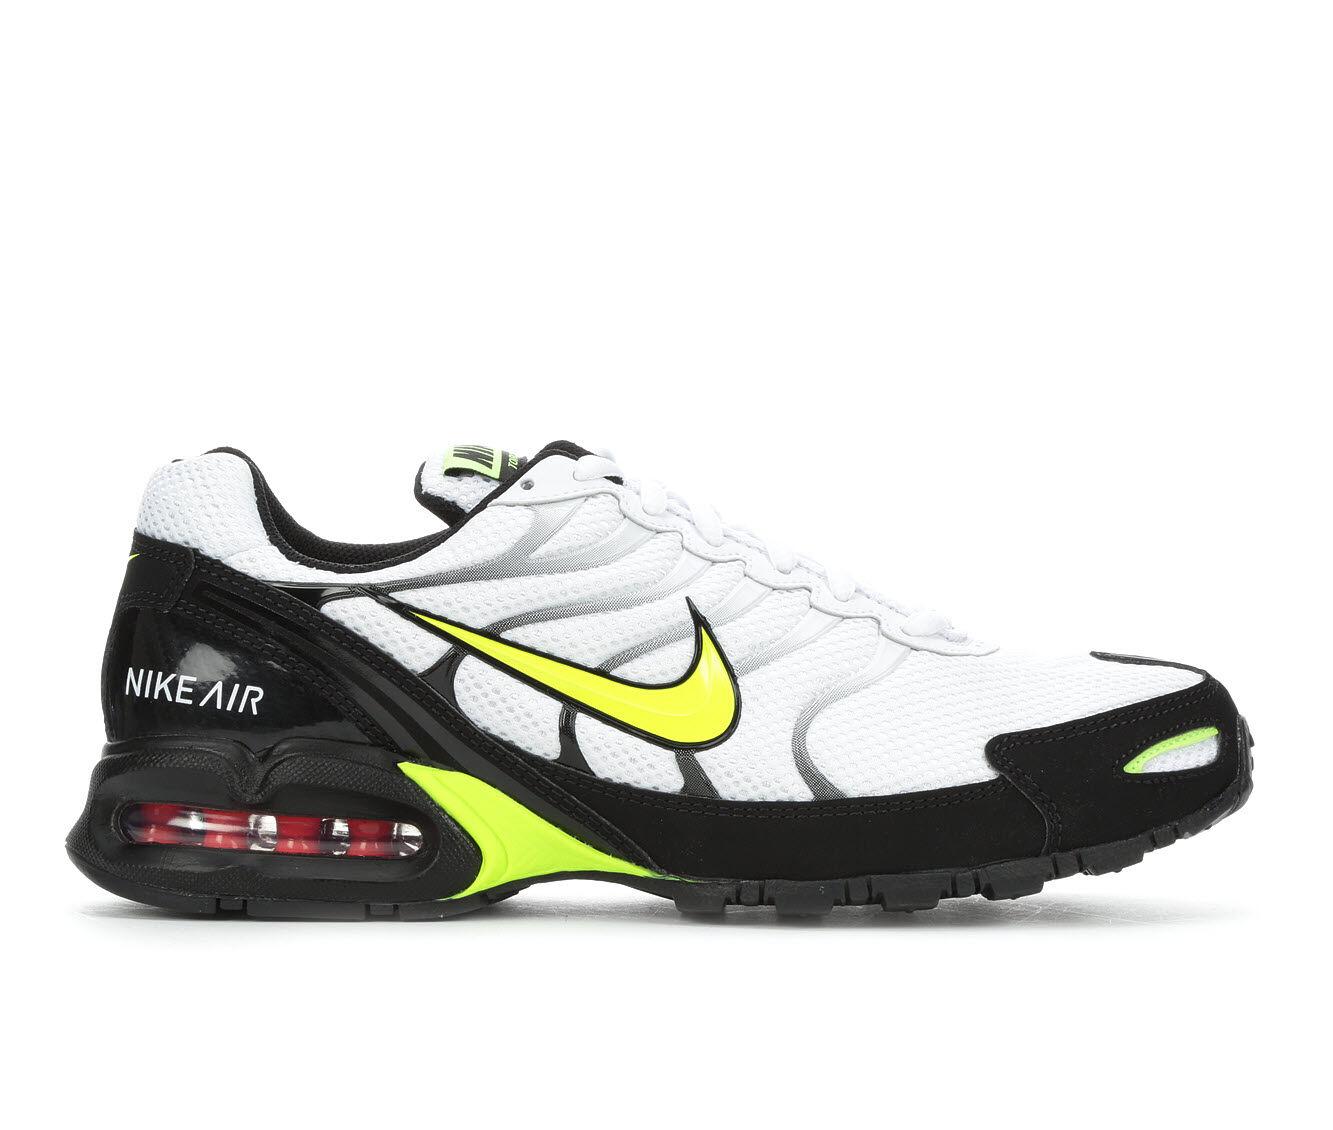 Tênis Nike Air Max 90 Leather Infantil | Tênis é na Authentic